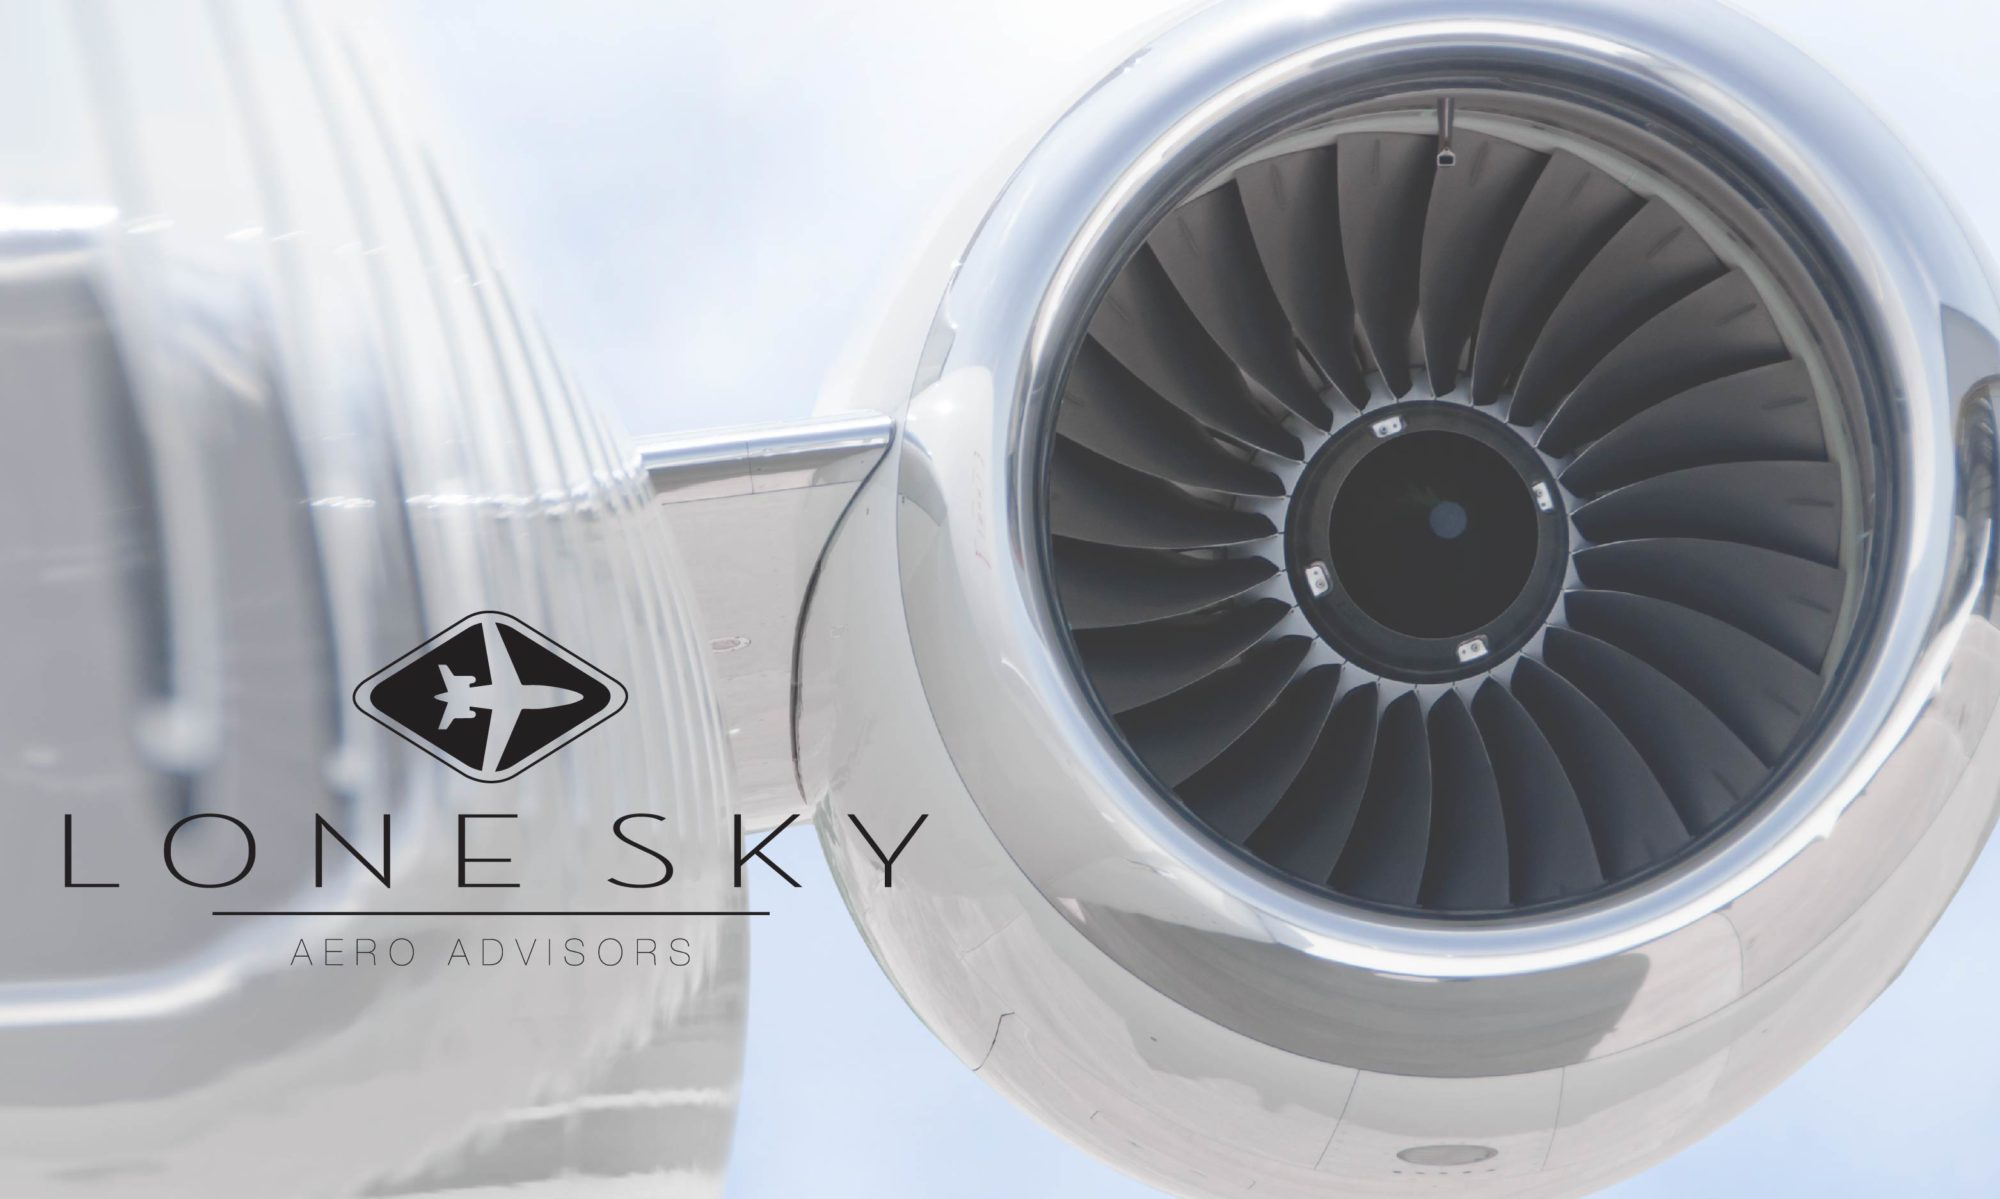 Lone Sky Aero Advisors